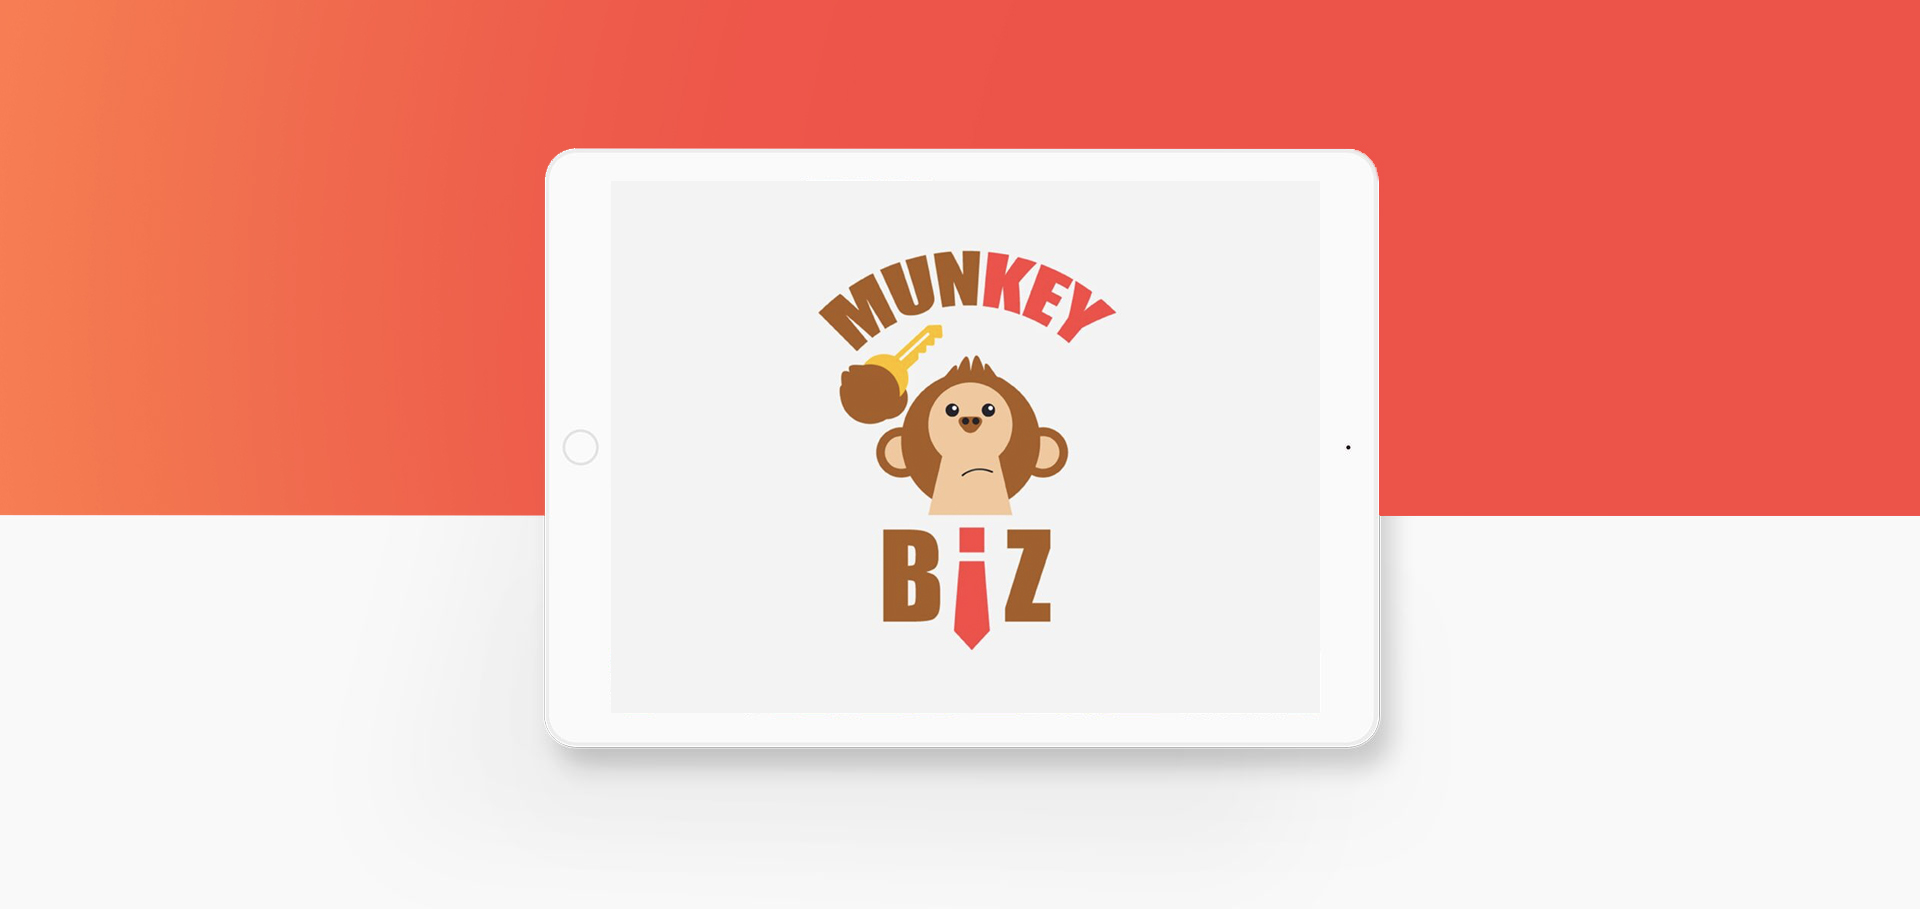 munkey-header